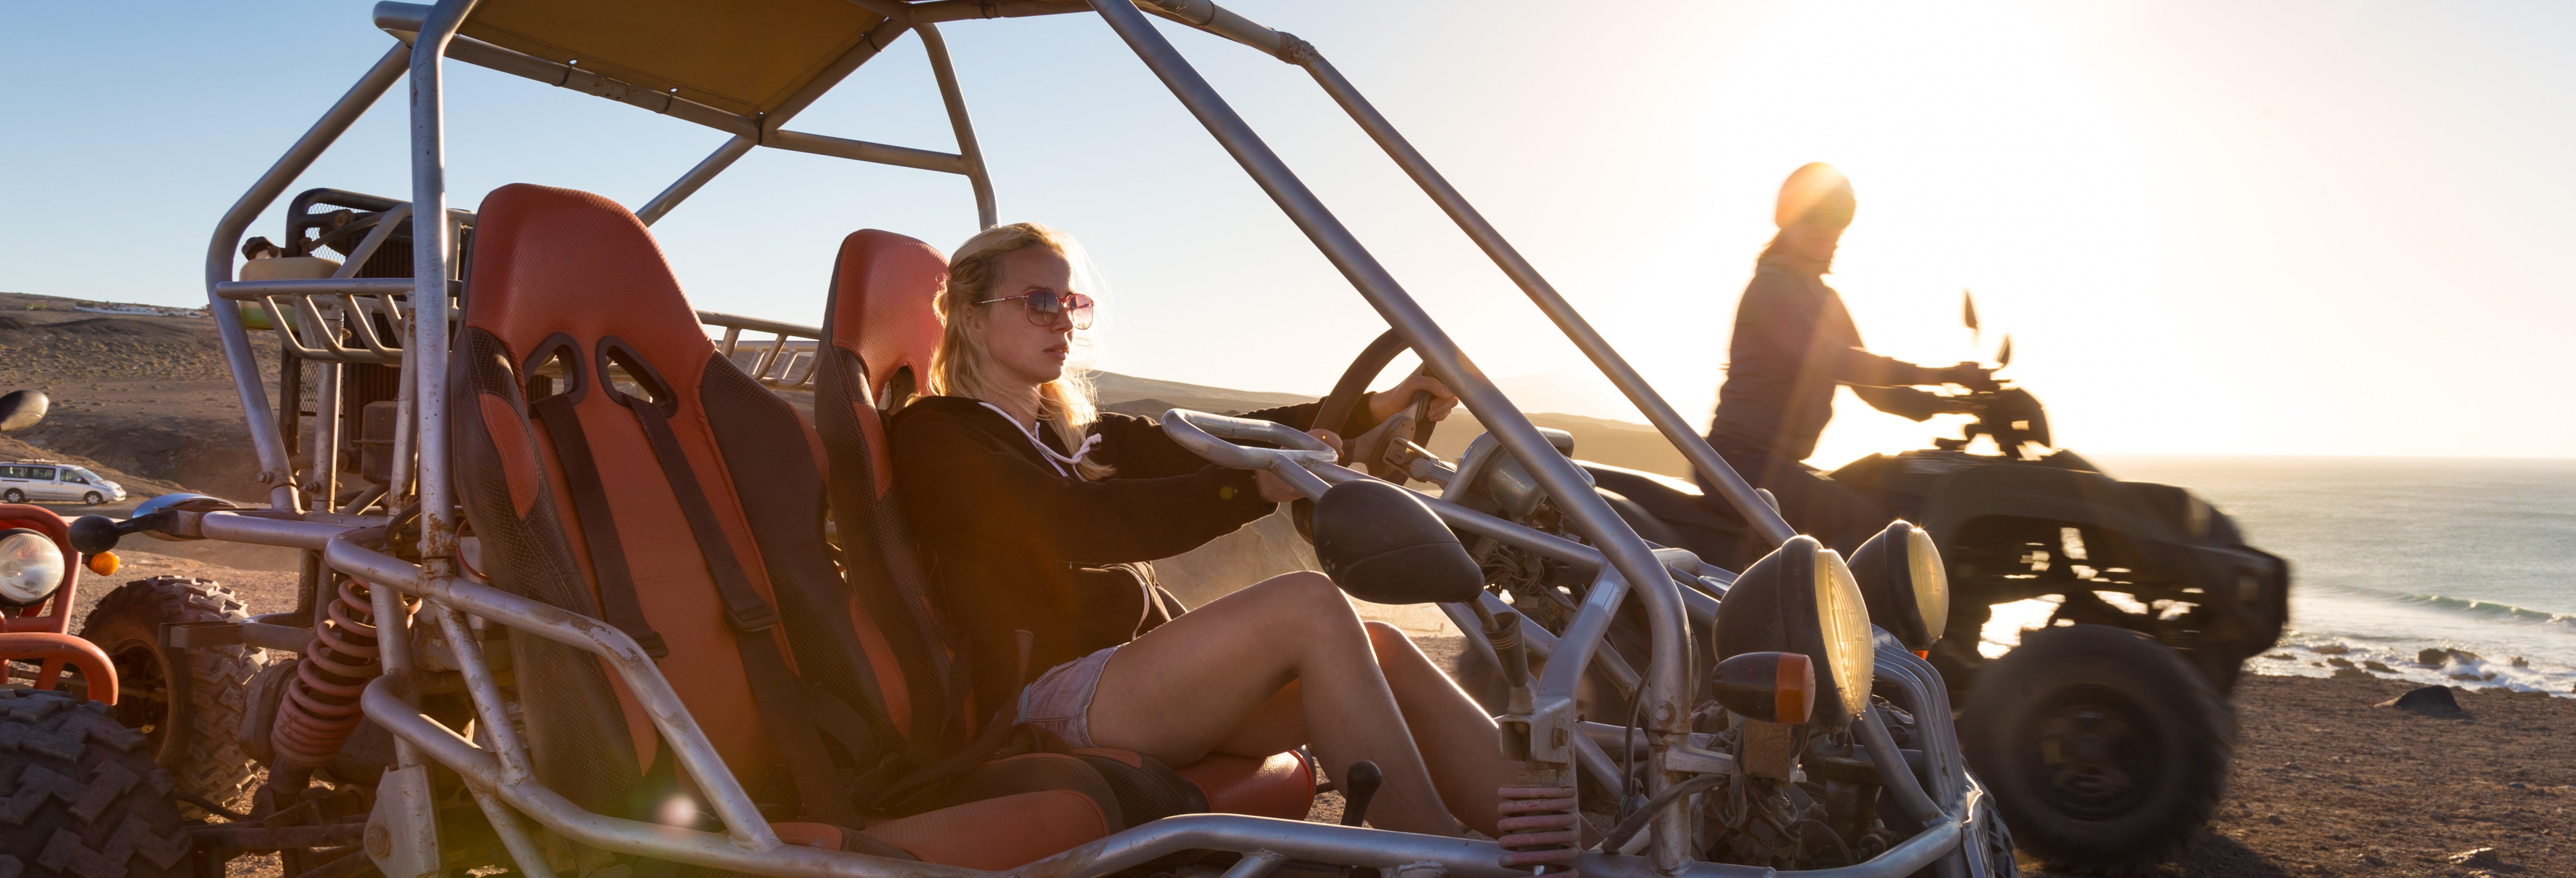 Tour de buggy pelo deserto